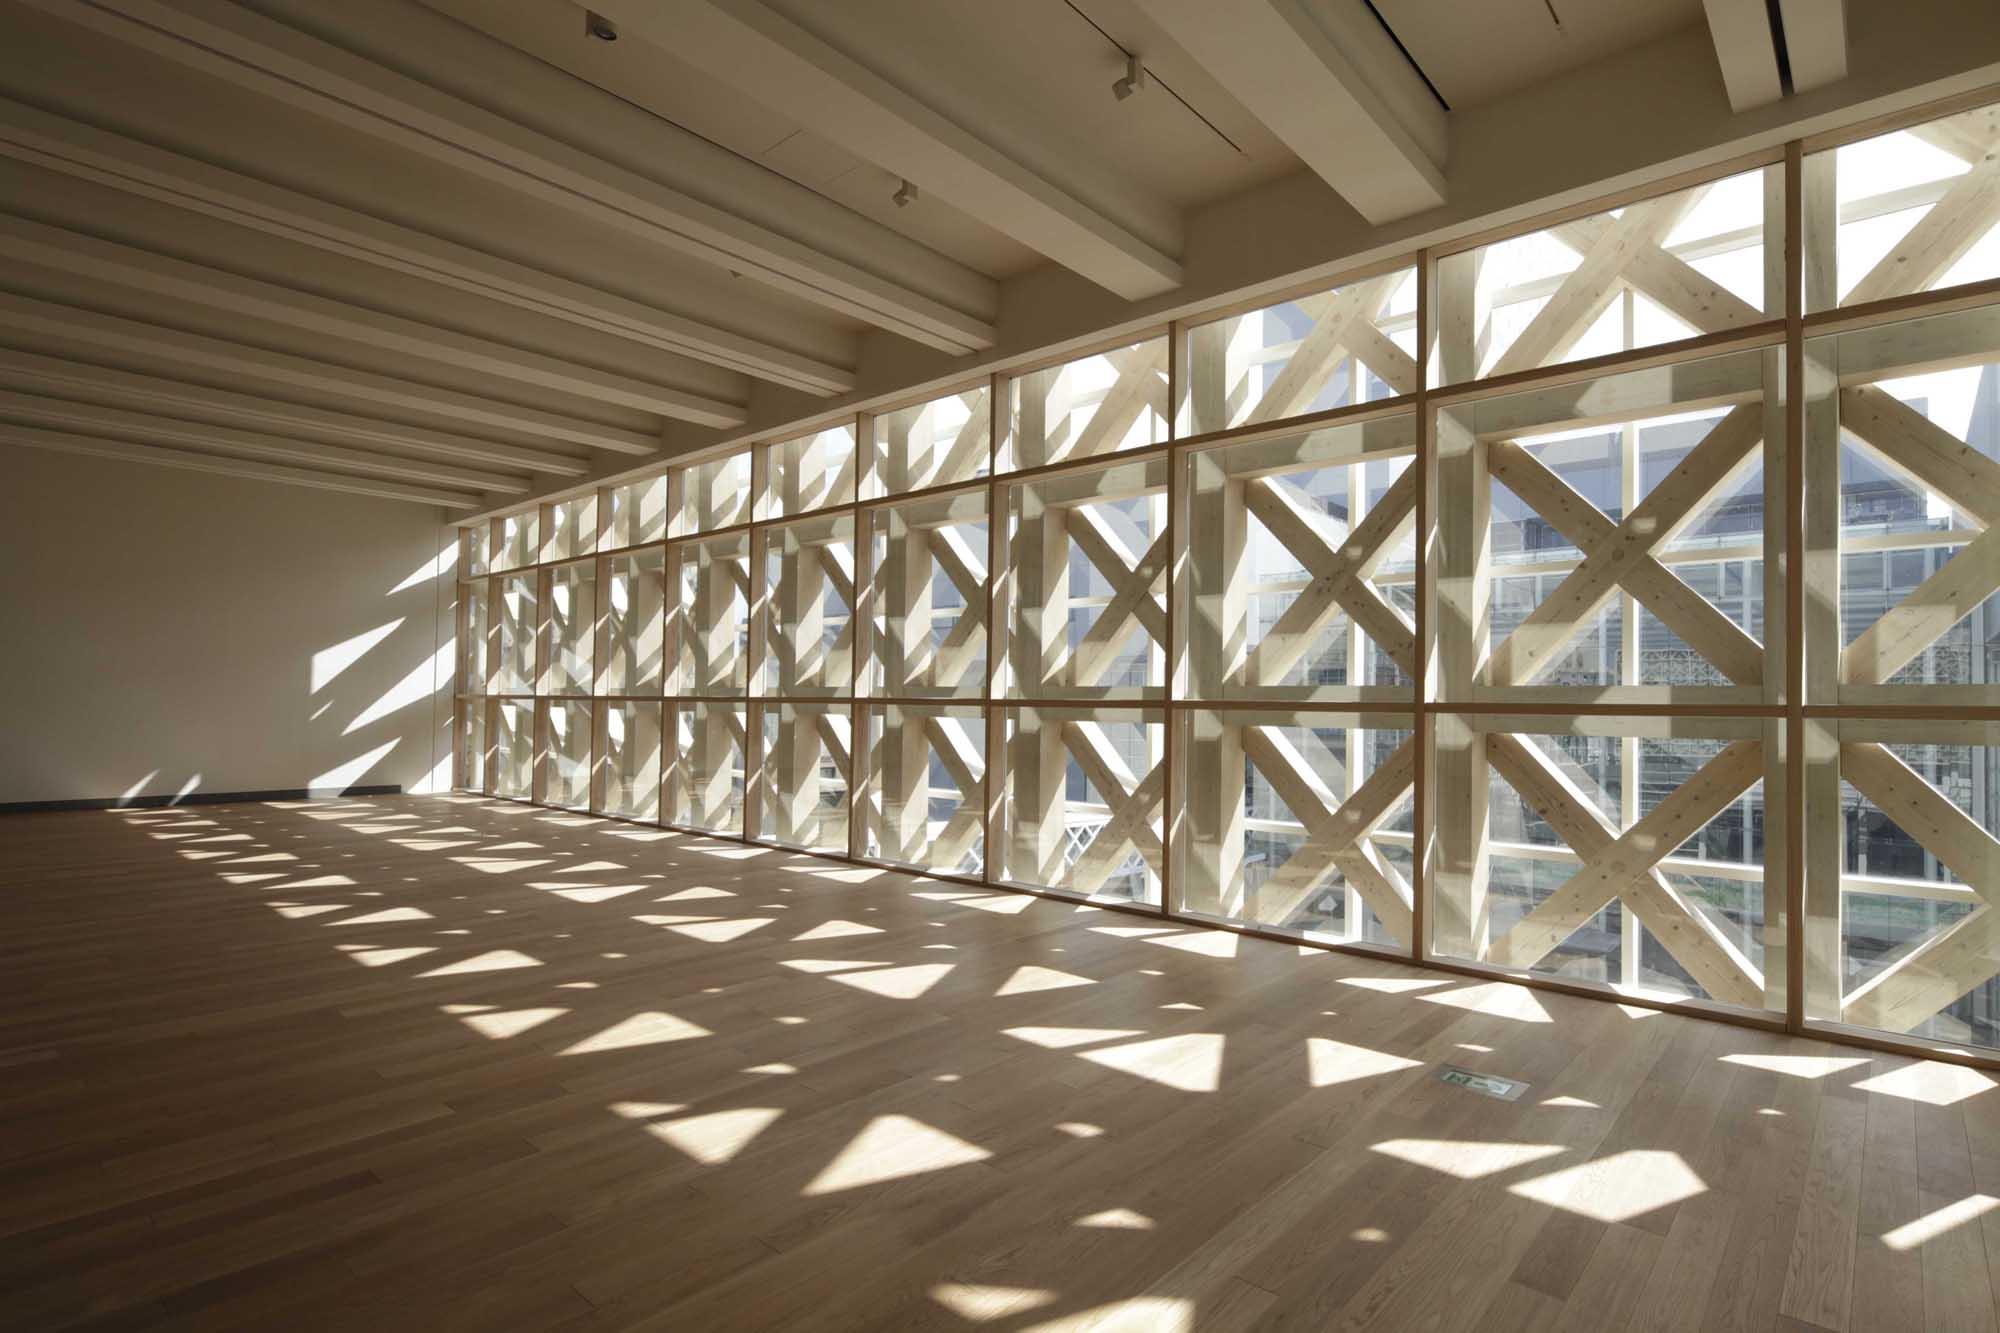 Sba Oita Prefectural Art Museum